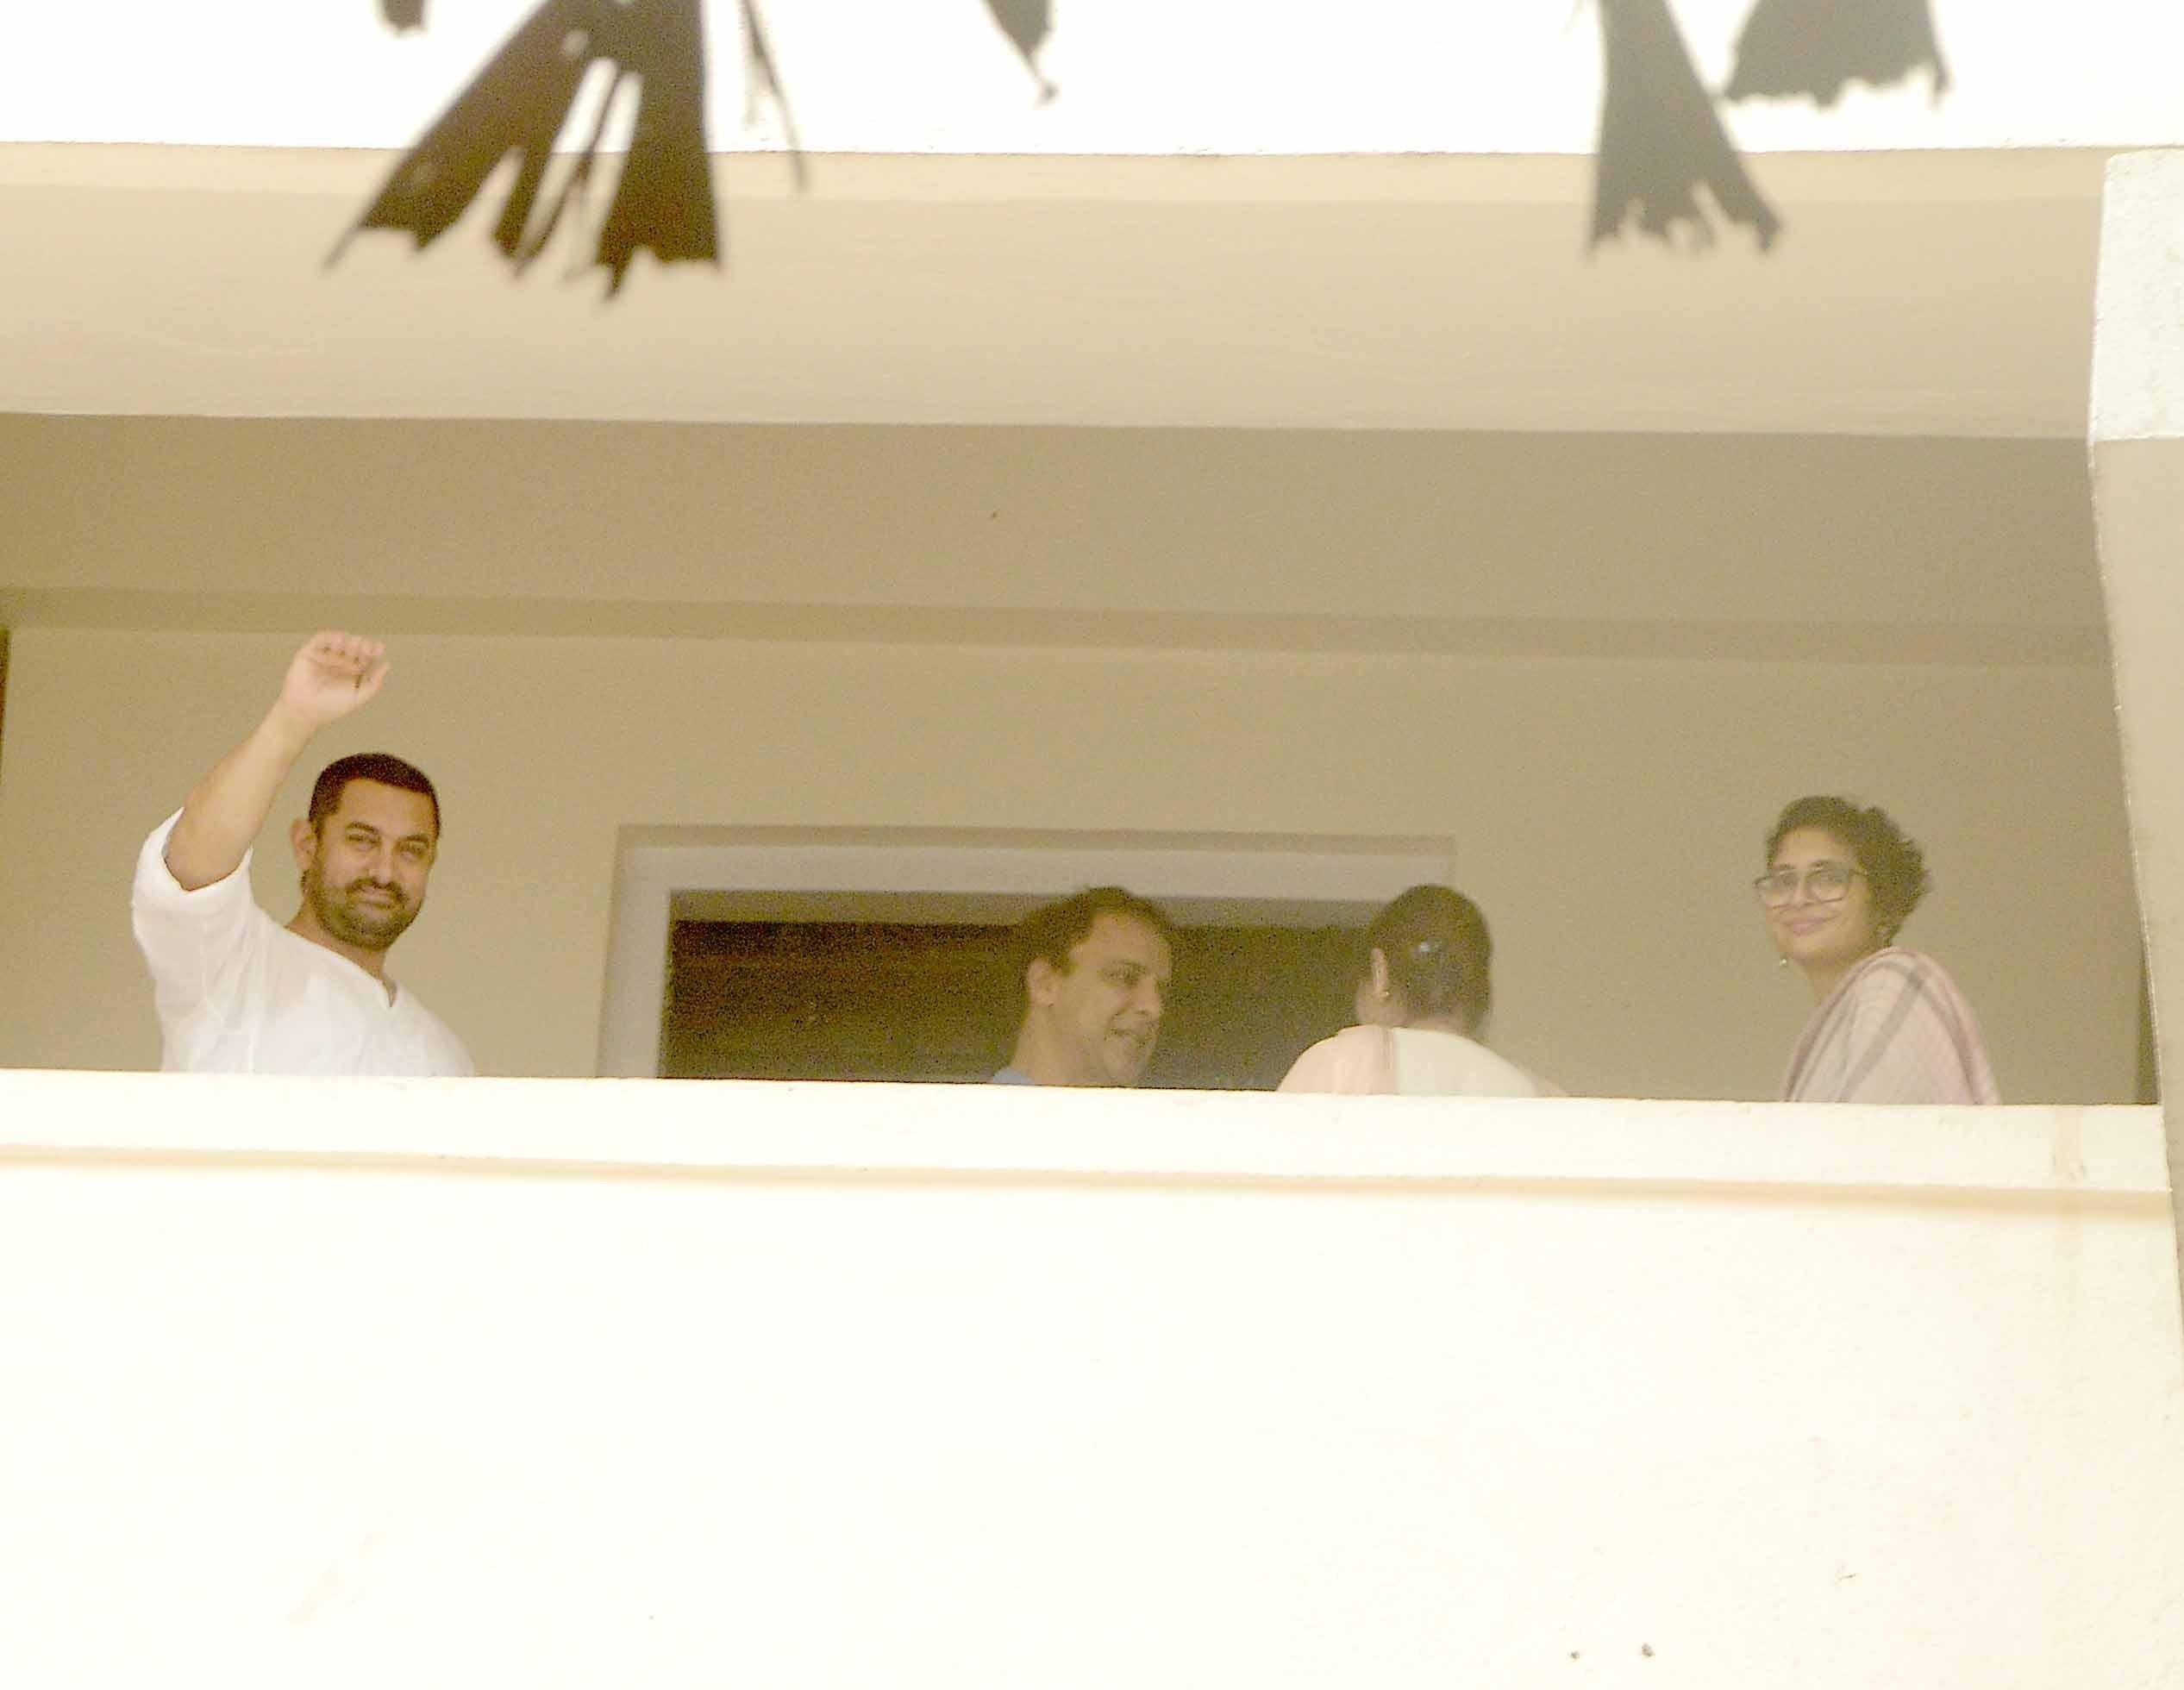 Aamir Khan and Kiran Rao celebrating Eid